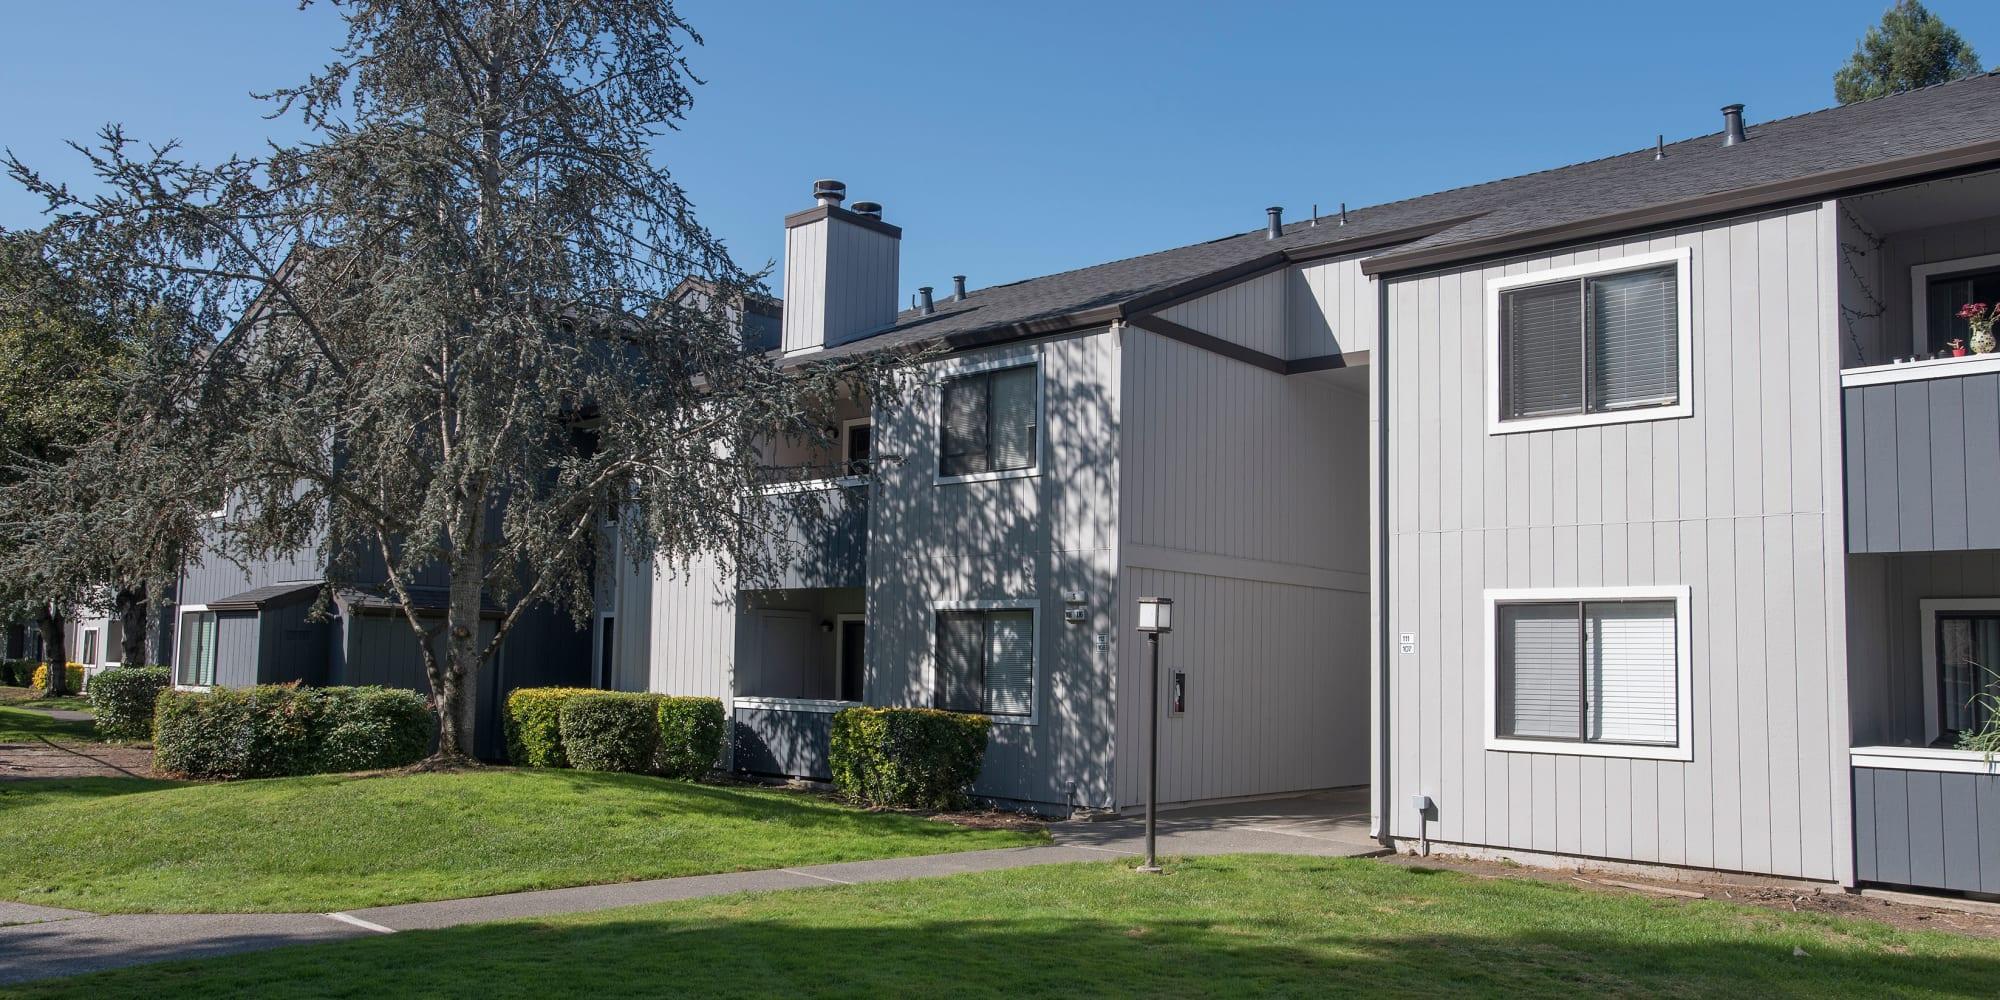 Apartments at Park Ridge Apartment Homes in Rohnert Park, California